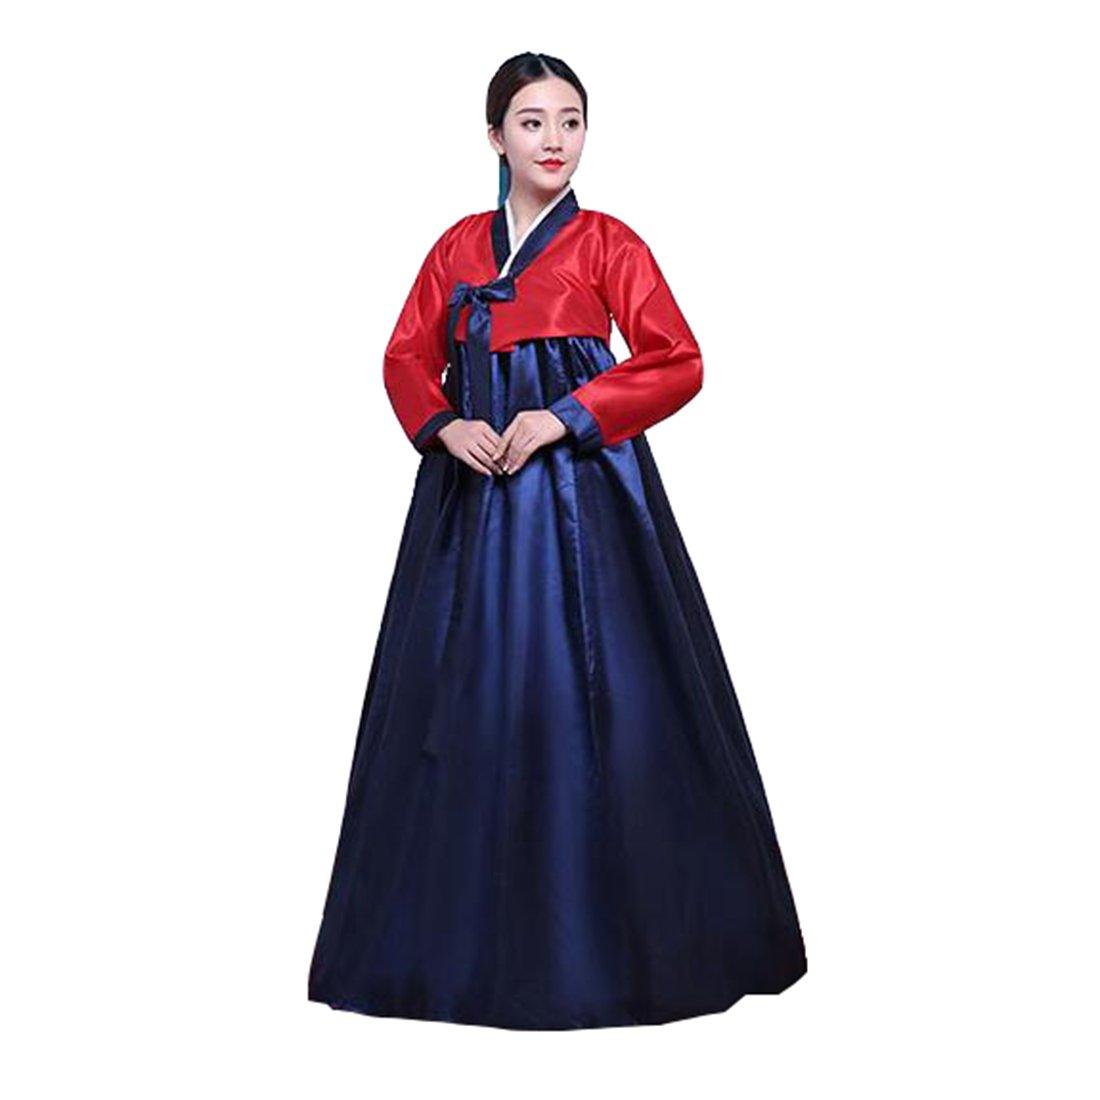 Ez-sofei Women's Fashion V Neck Pagoda Sleeve Back Zipper Short T-Shirts Liansheng KBK012-RRDB-L